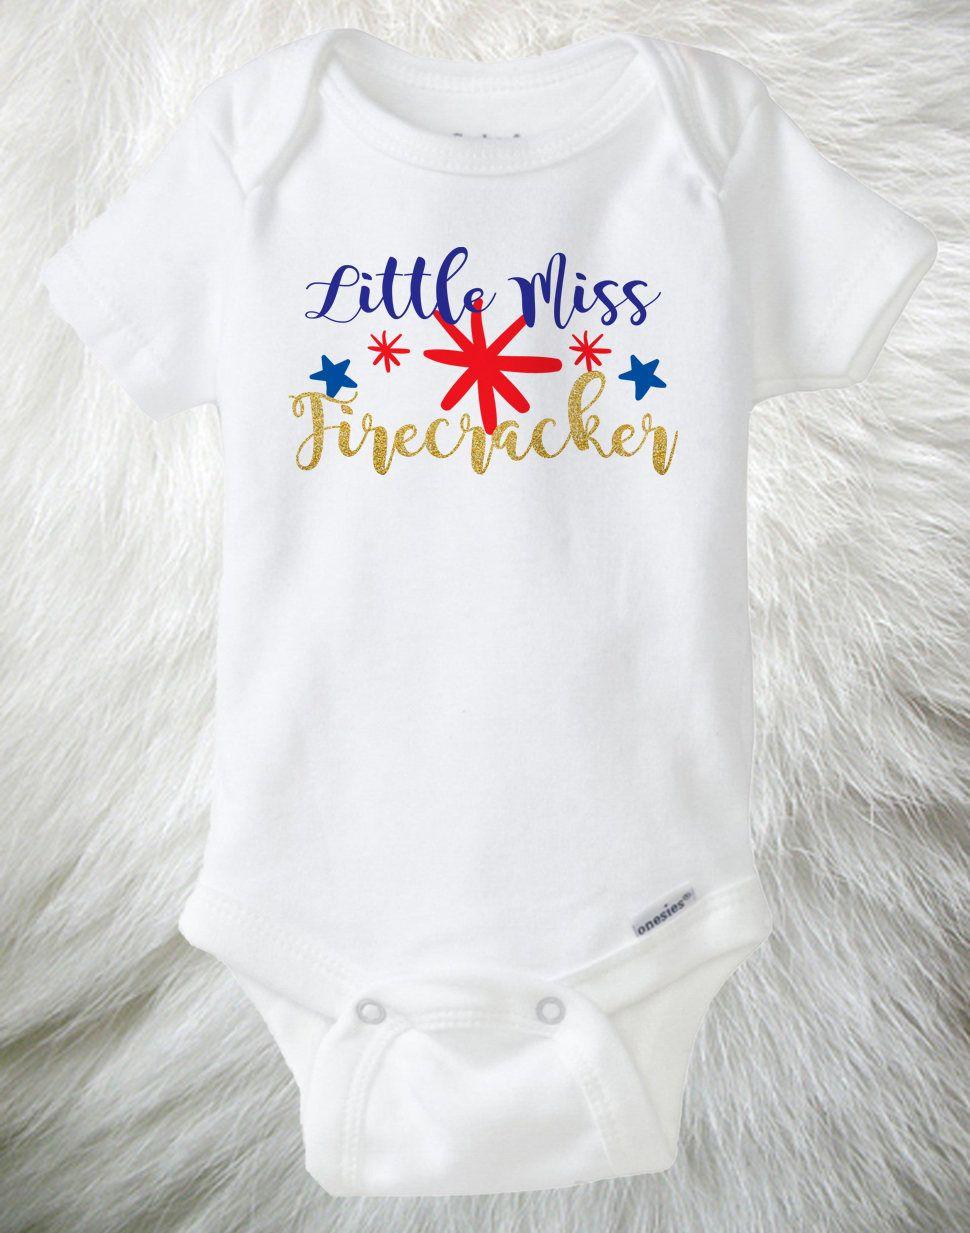 Little Miss 4th of July Newbaby Baby Romper Summer Short Sleeve Onesie